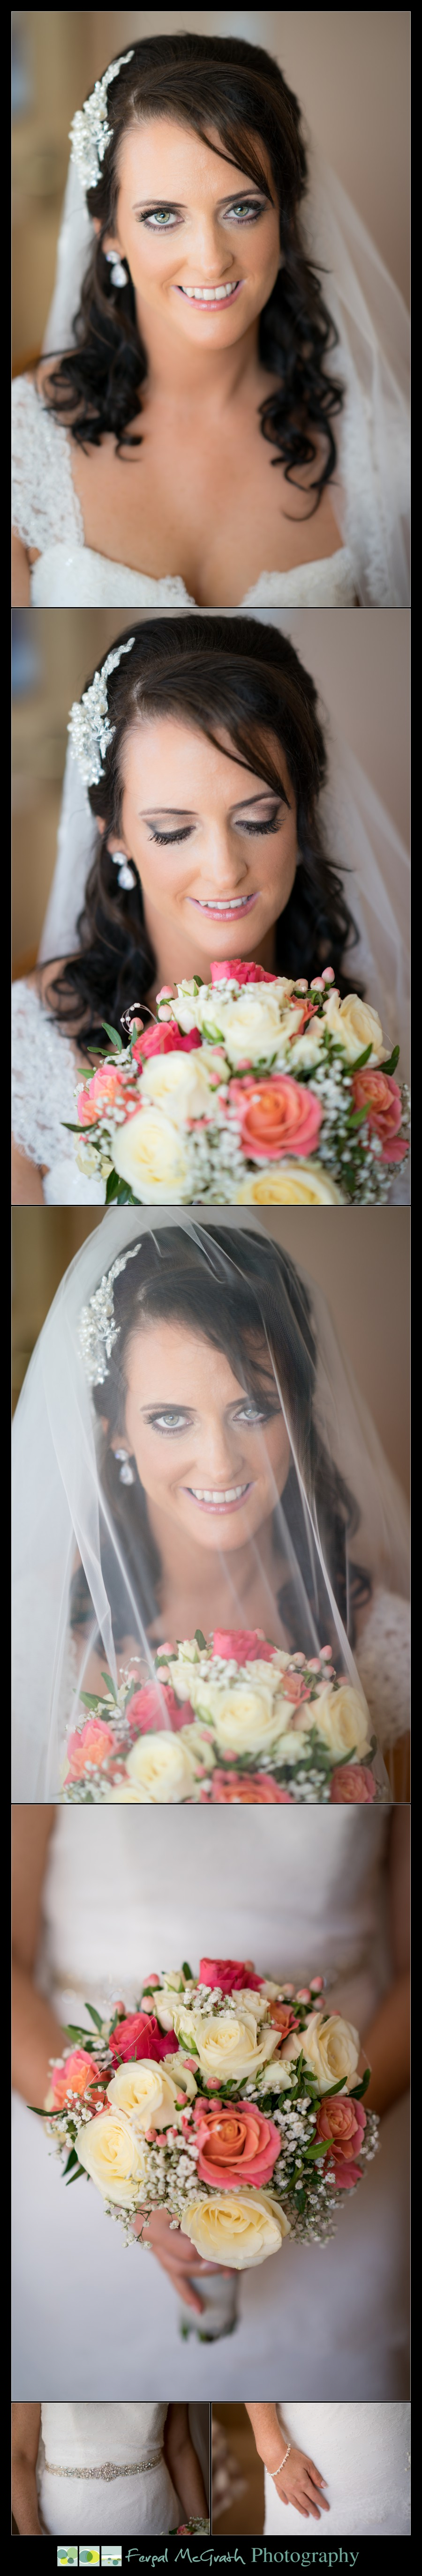 Mill Park Hotel Wedding Laura + John beautiful donegal bride wedding portraits